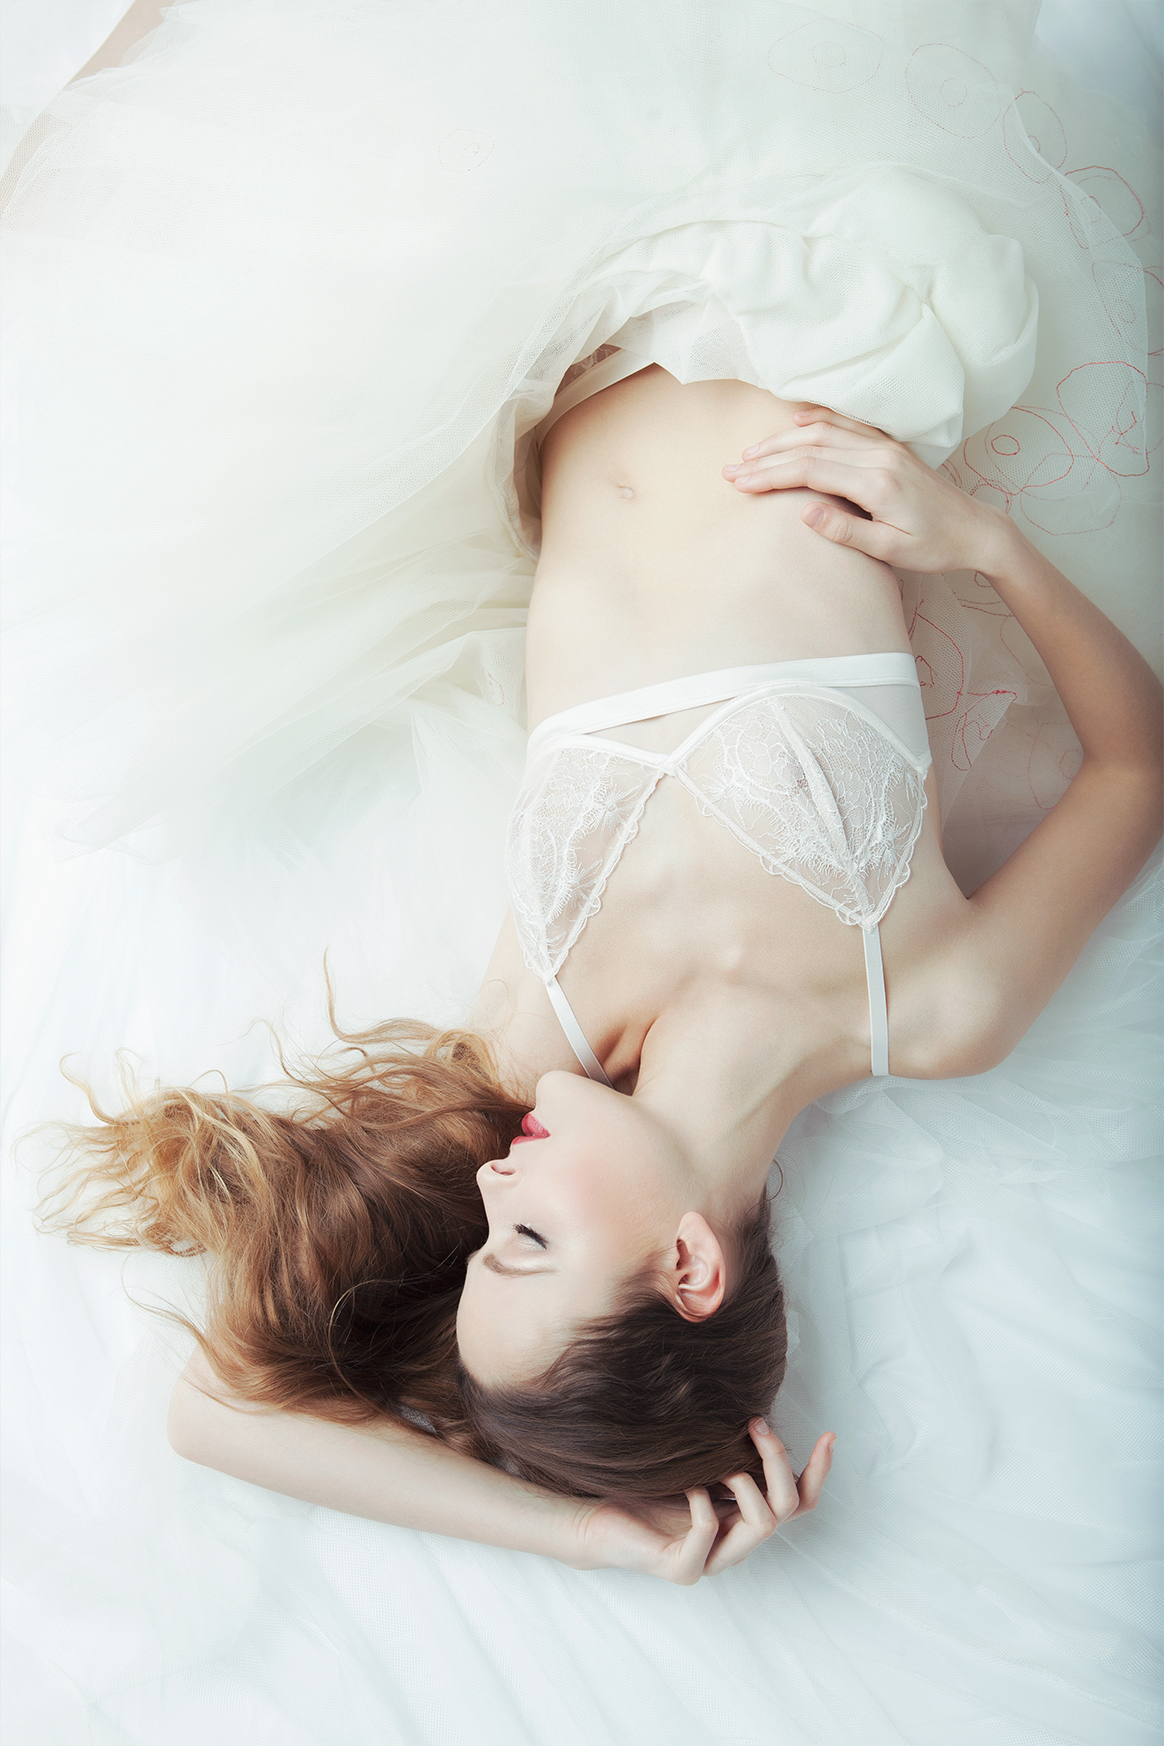 Streetglams: white lingerie magic for Passionata